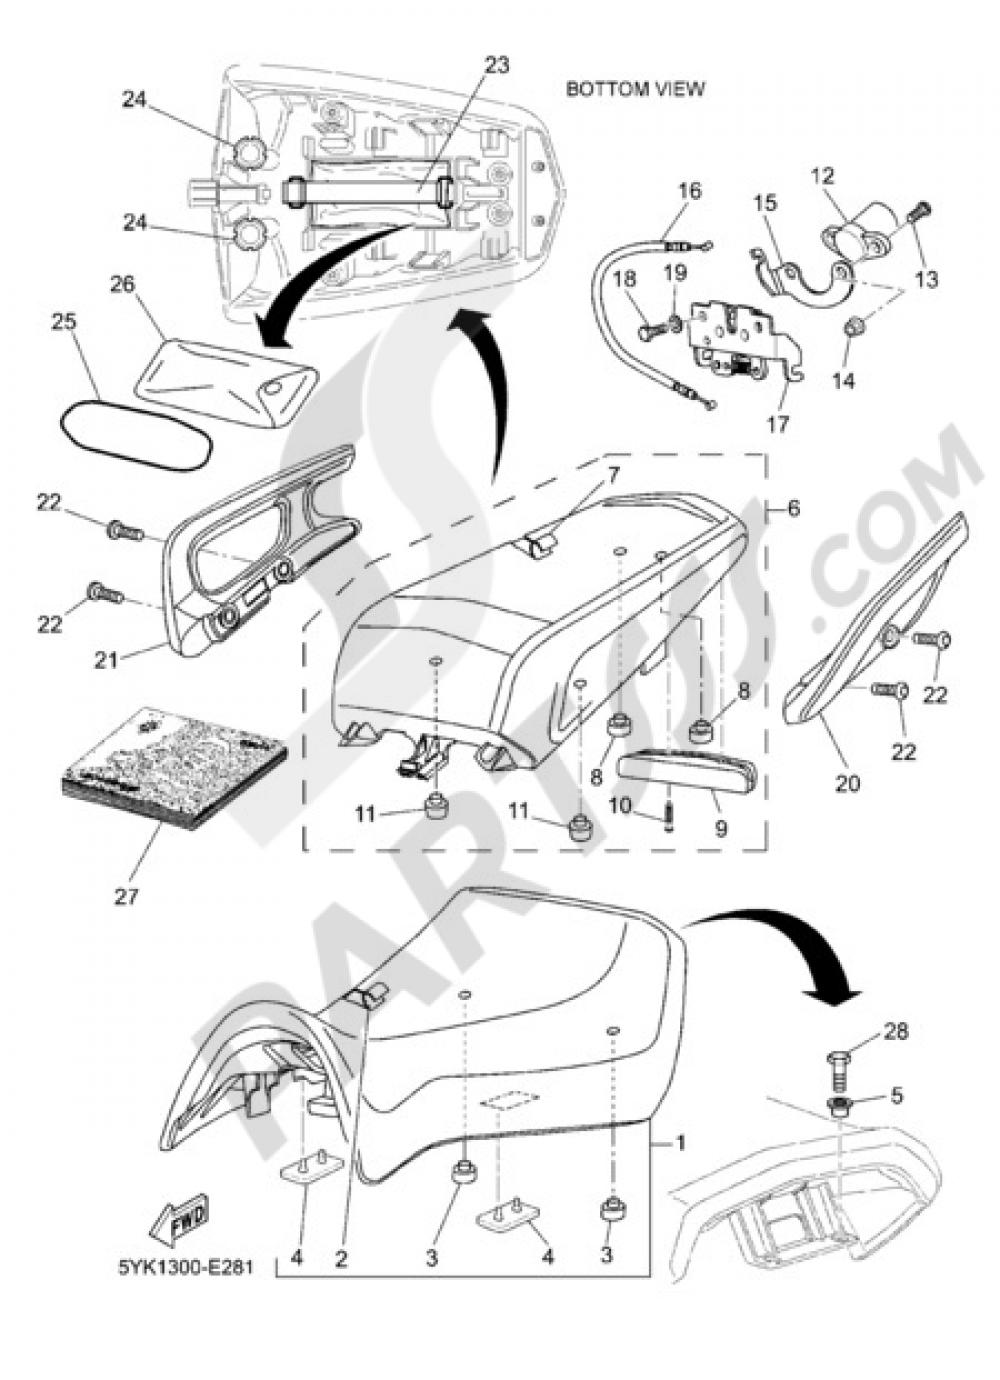 SEAT Yamaha MT-03 2007